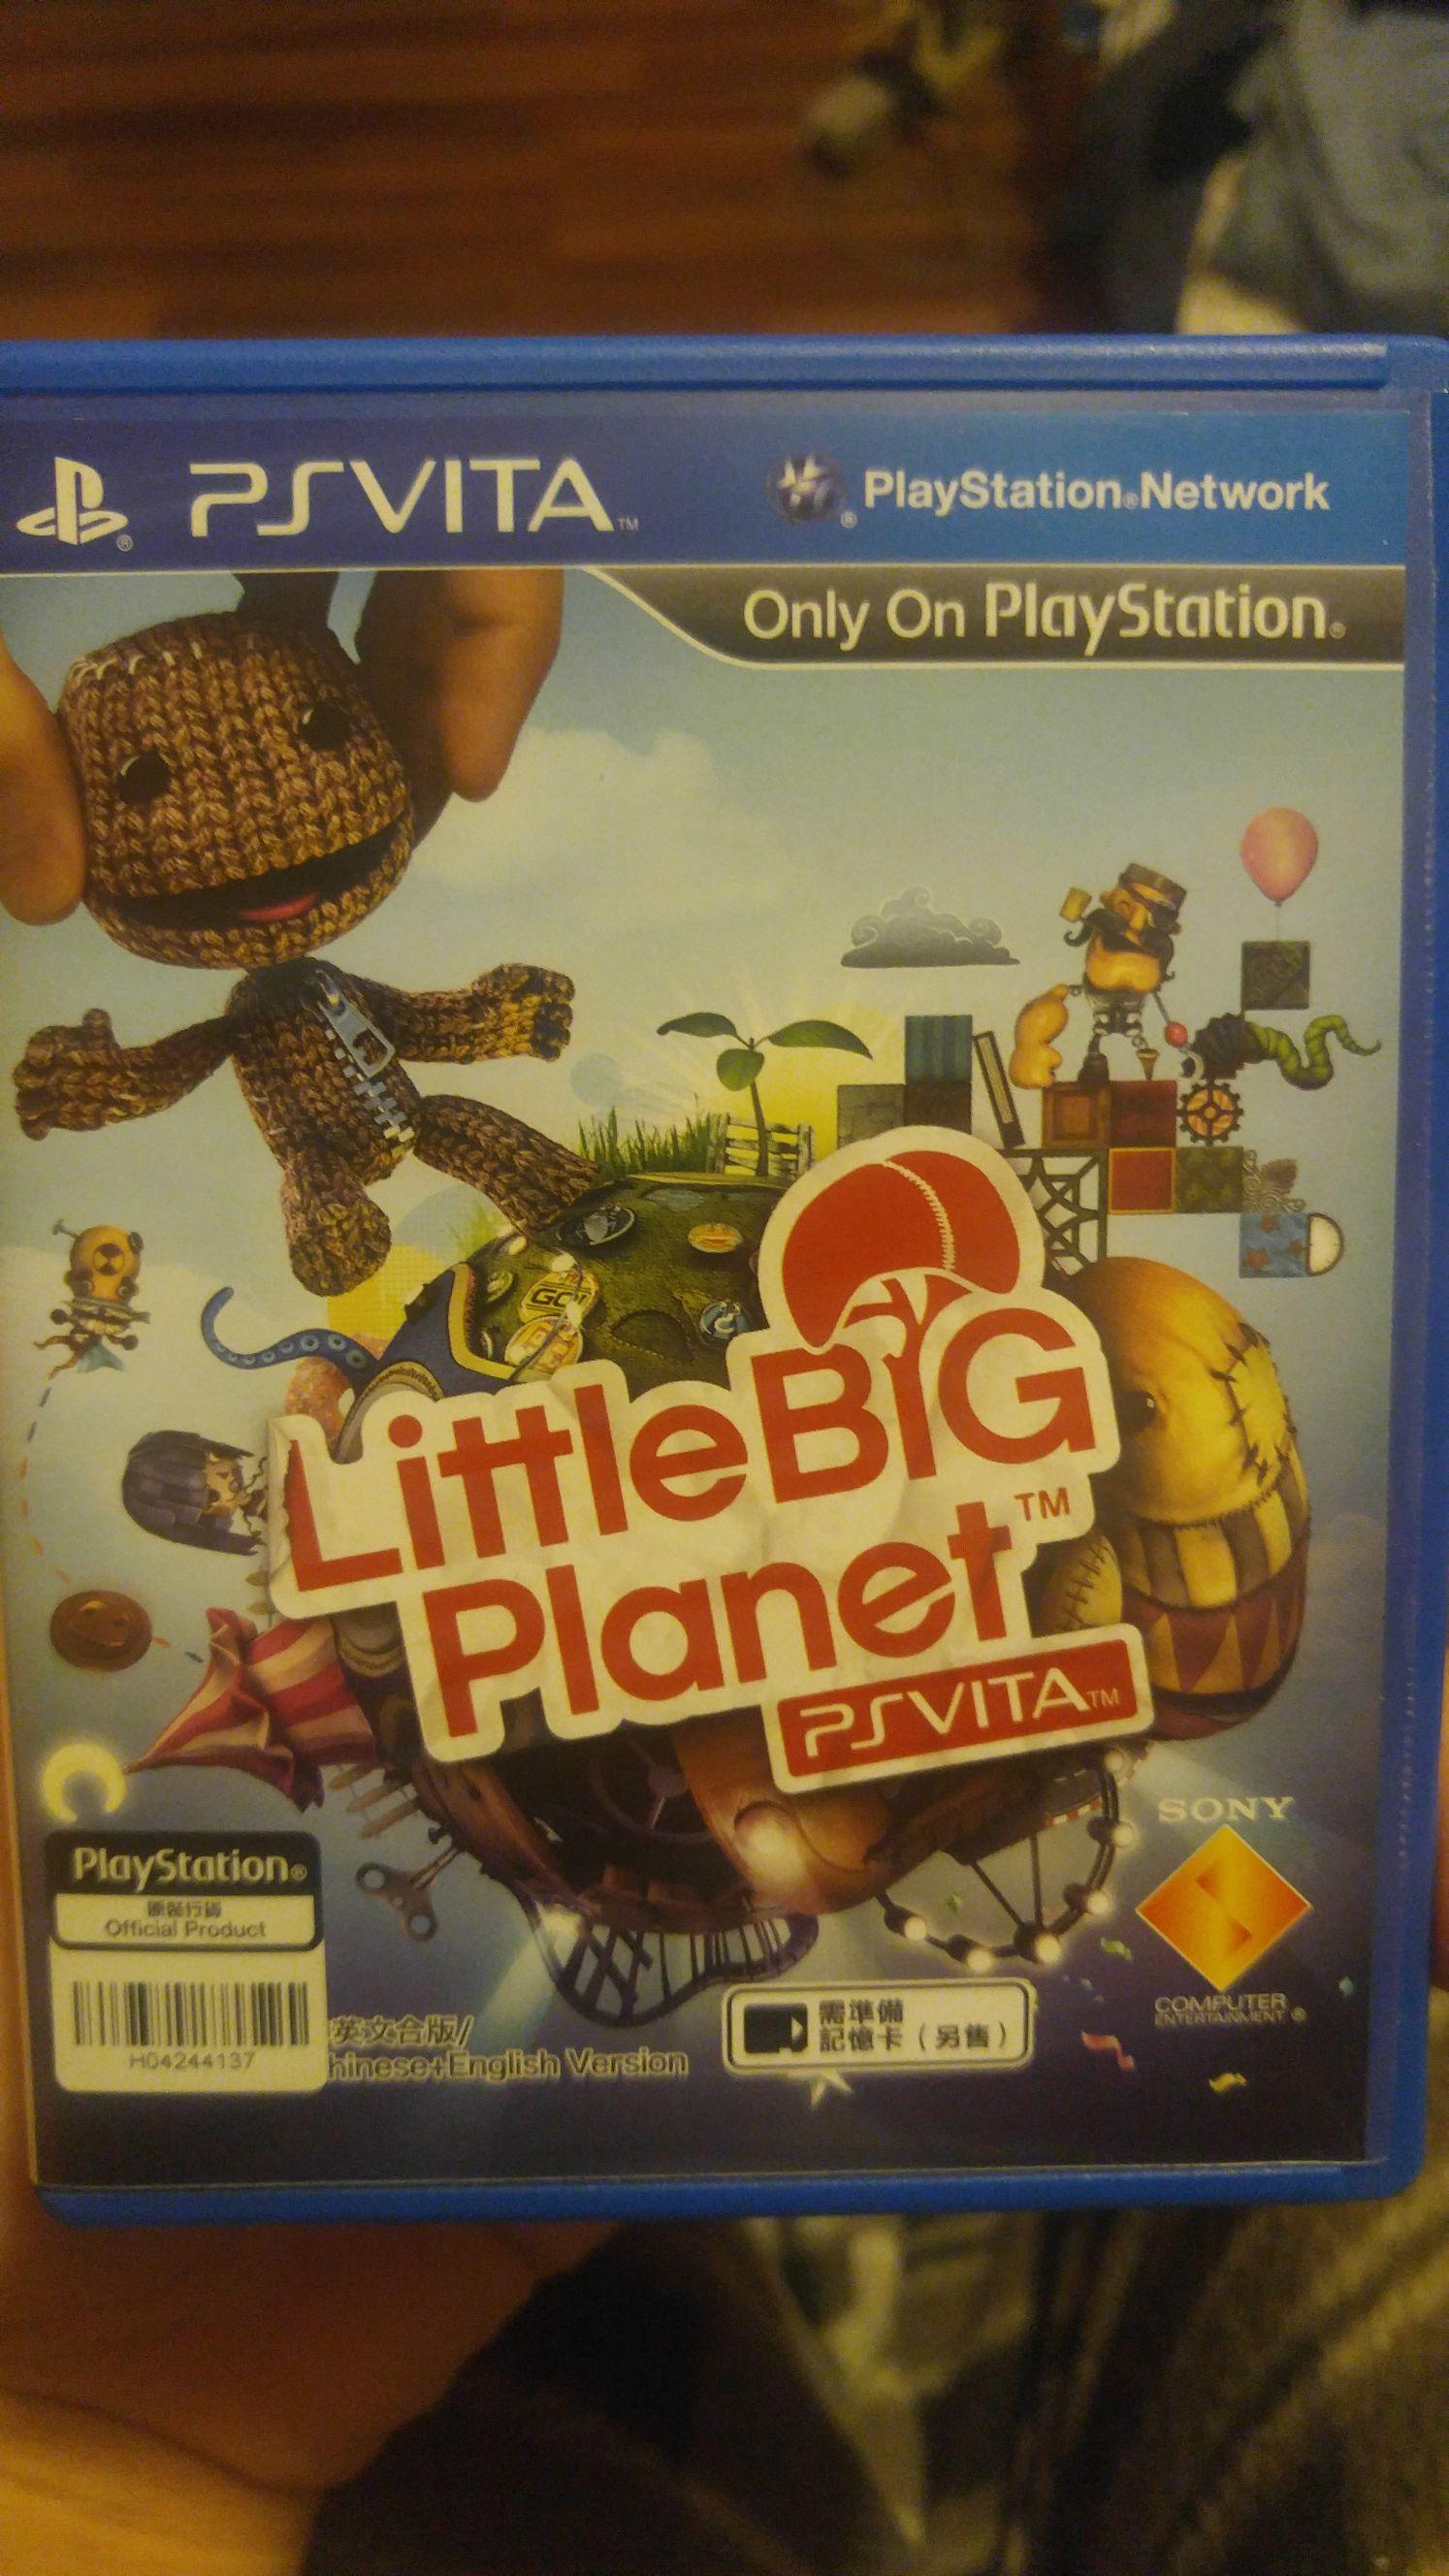 Little Big Planet - PS Vita cover